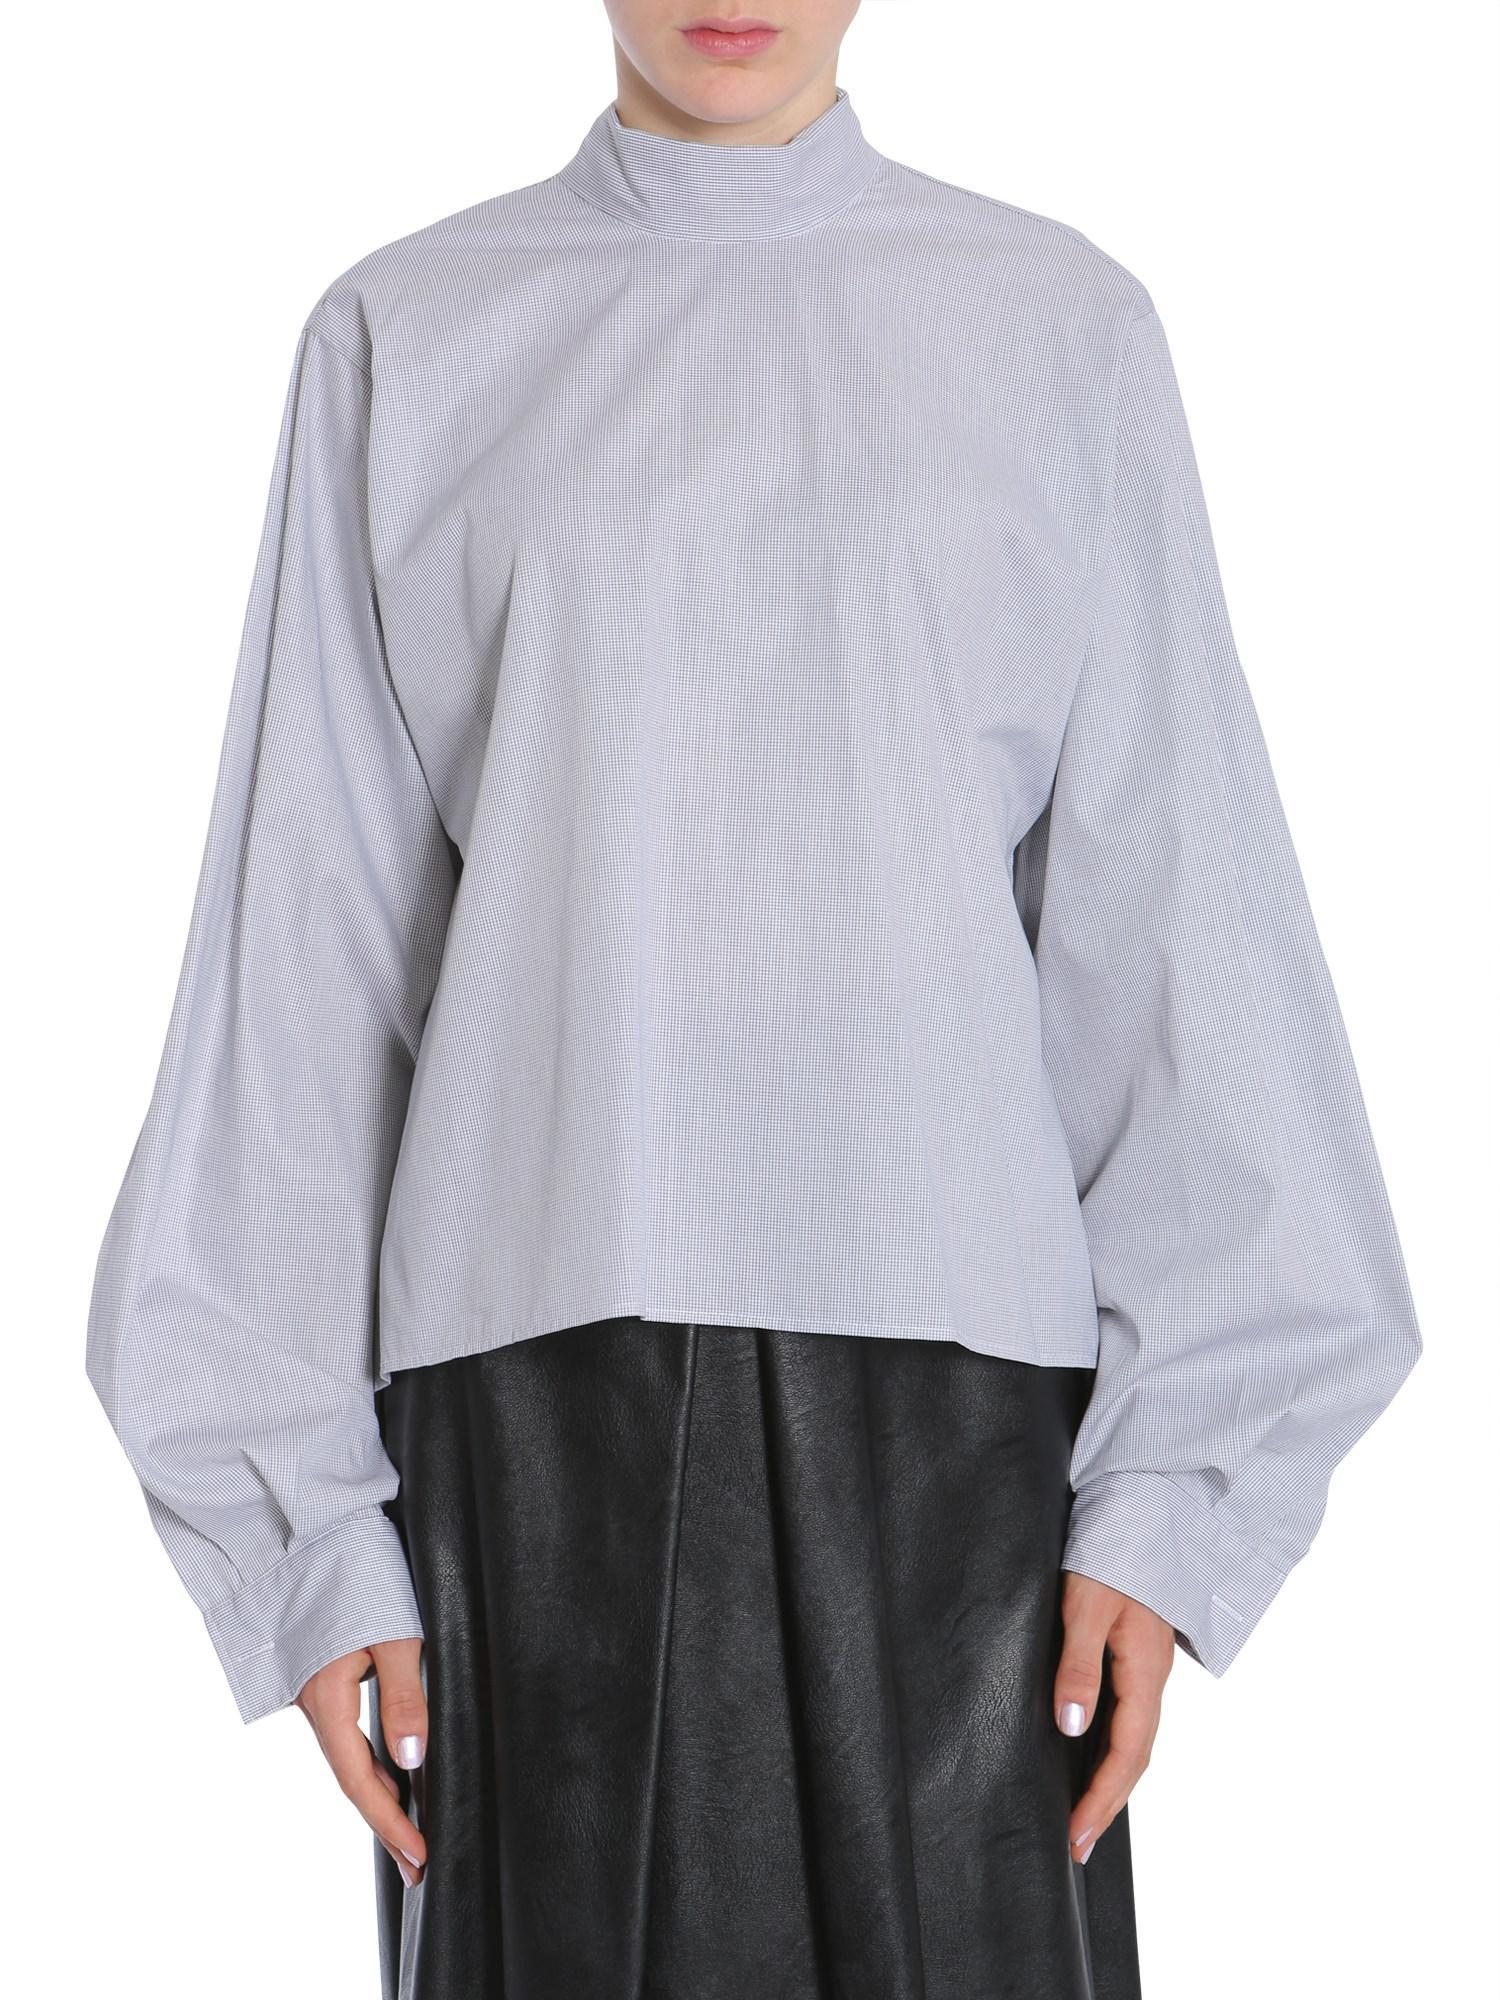 Maison Margiela Woman Appliquéd Striped Cotton-poplin Shirt Blue Size 40 Maison Martin Margiela Red Pre Order Eastbay Fashionable Sale Online Ewe4v